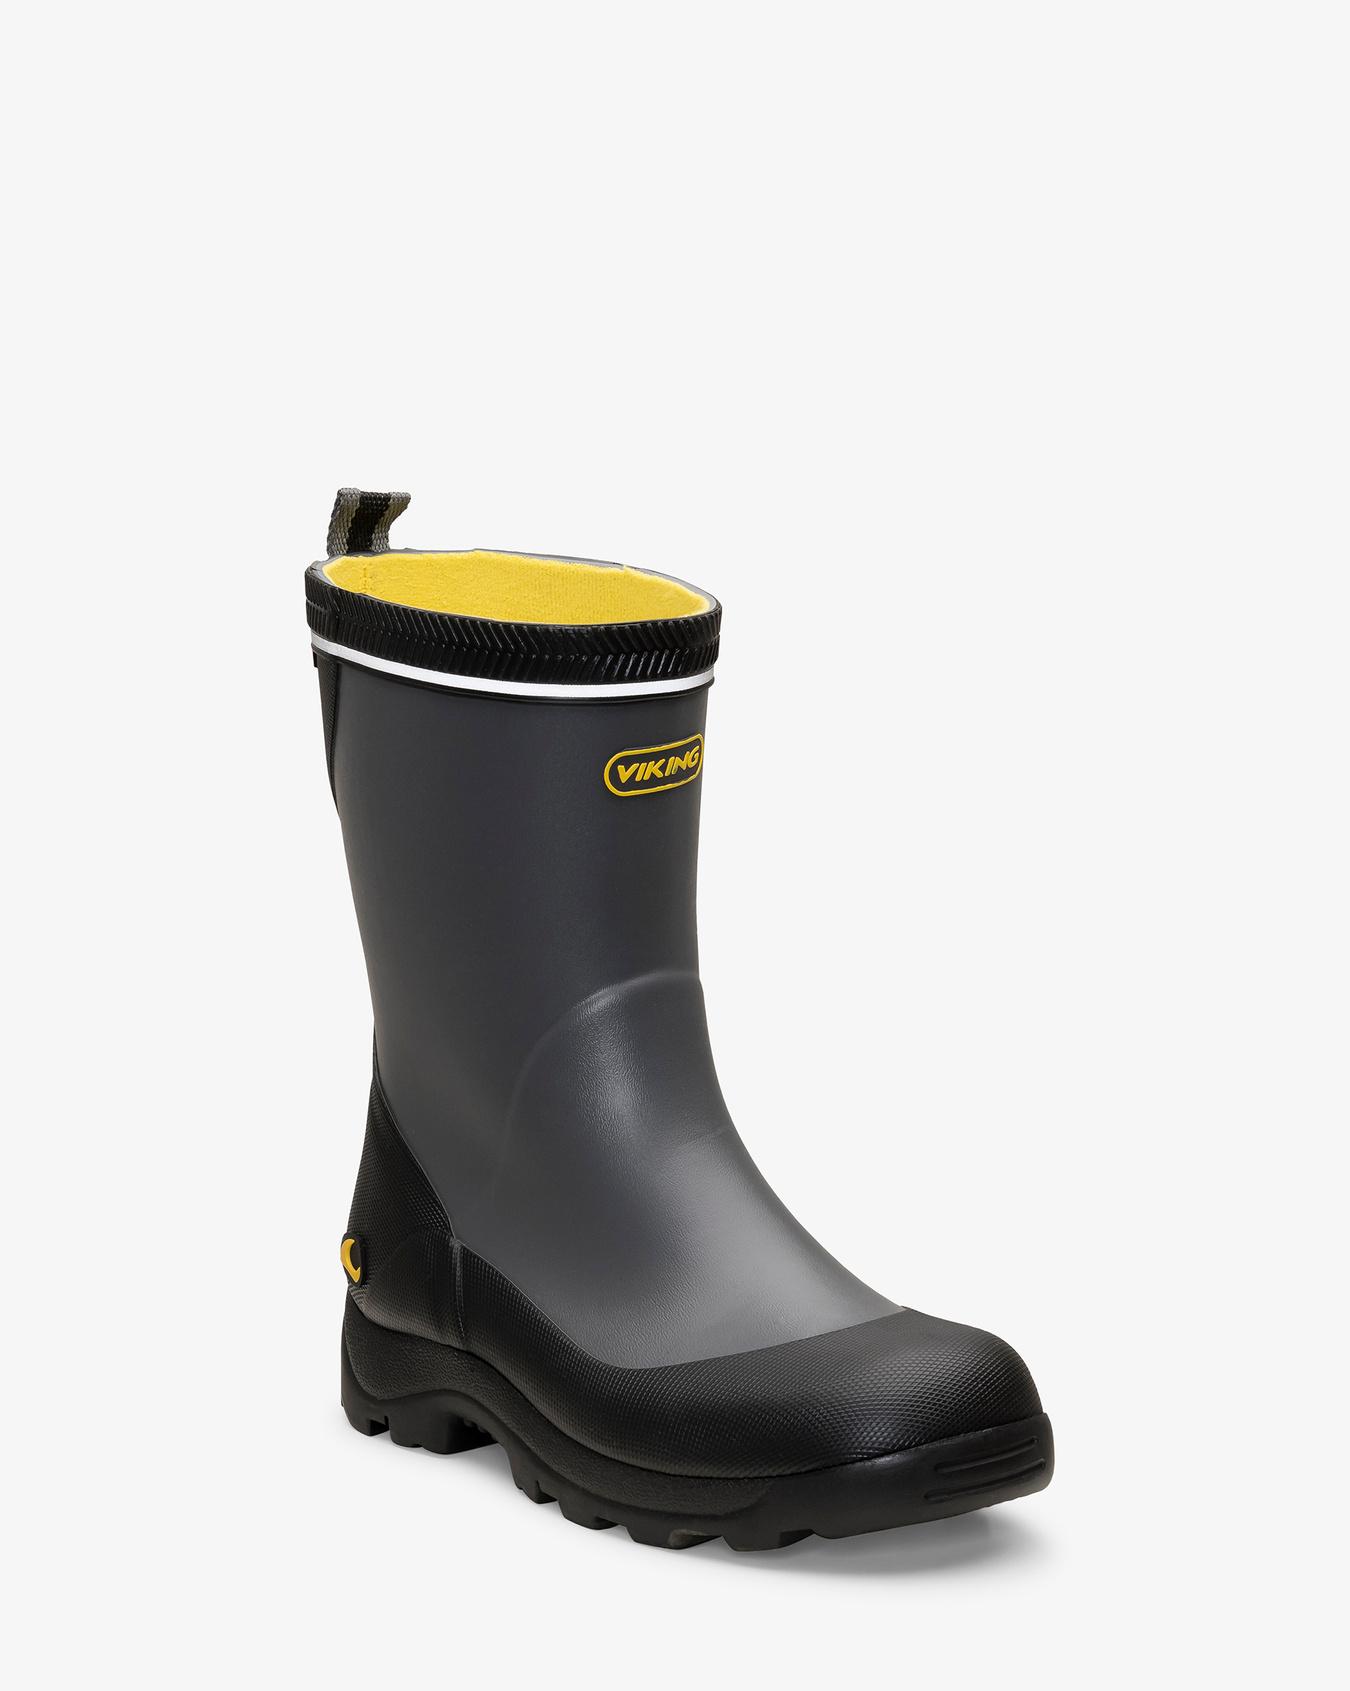 Storm Jr Rubber Boot